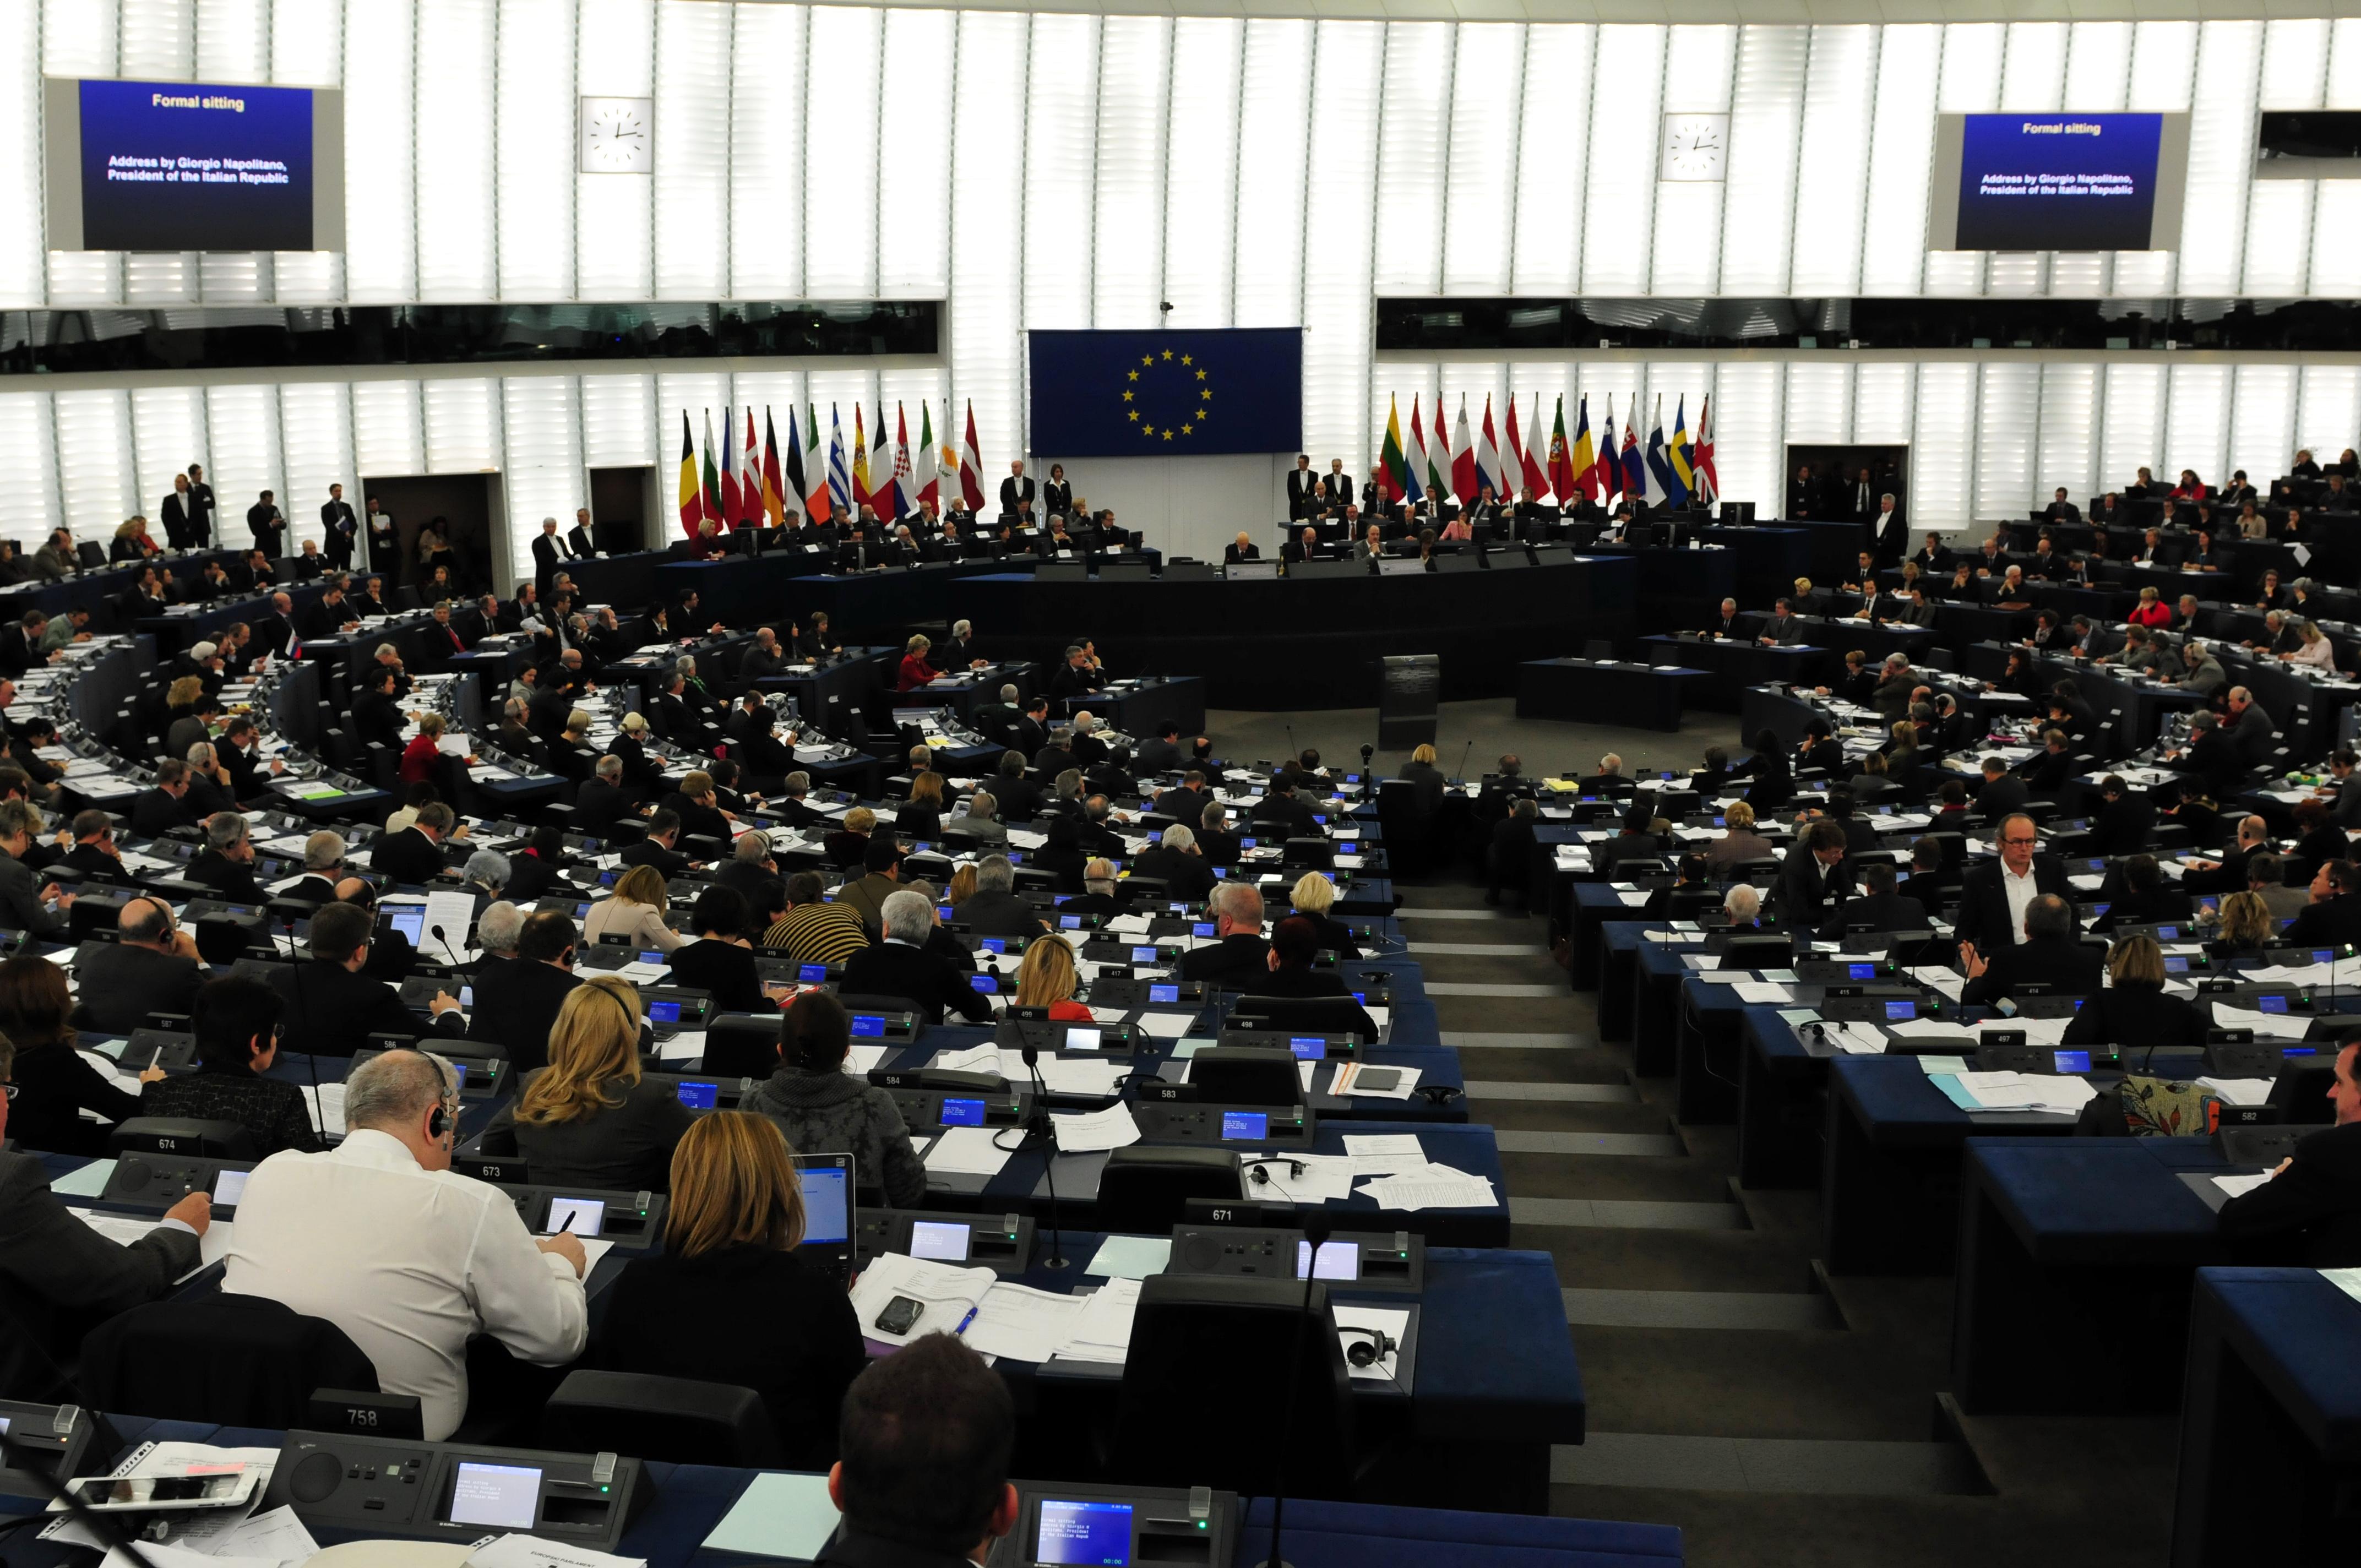 https://upload.wikimedia.org/wikipedia/commons/2/2c/14-02-04-strasbourgh-parliament-RalfR-43.jpg